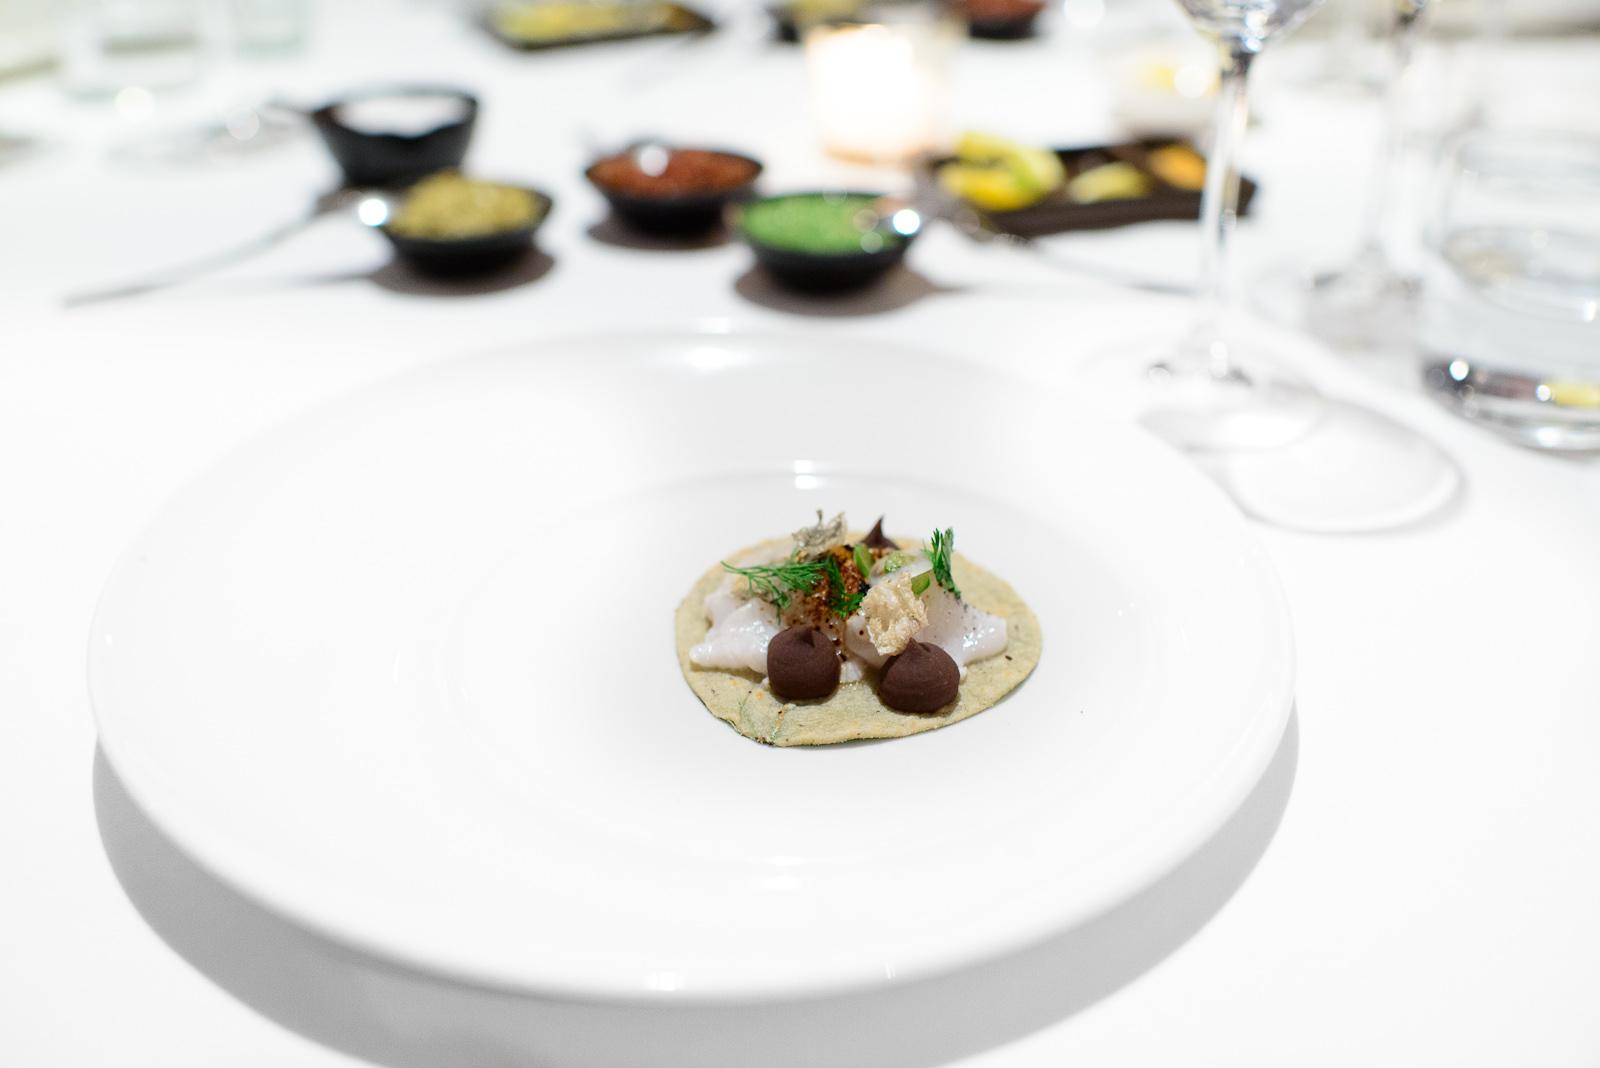 4th Course: Taquito de pescado, frijol, chicharrón, hoja santa